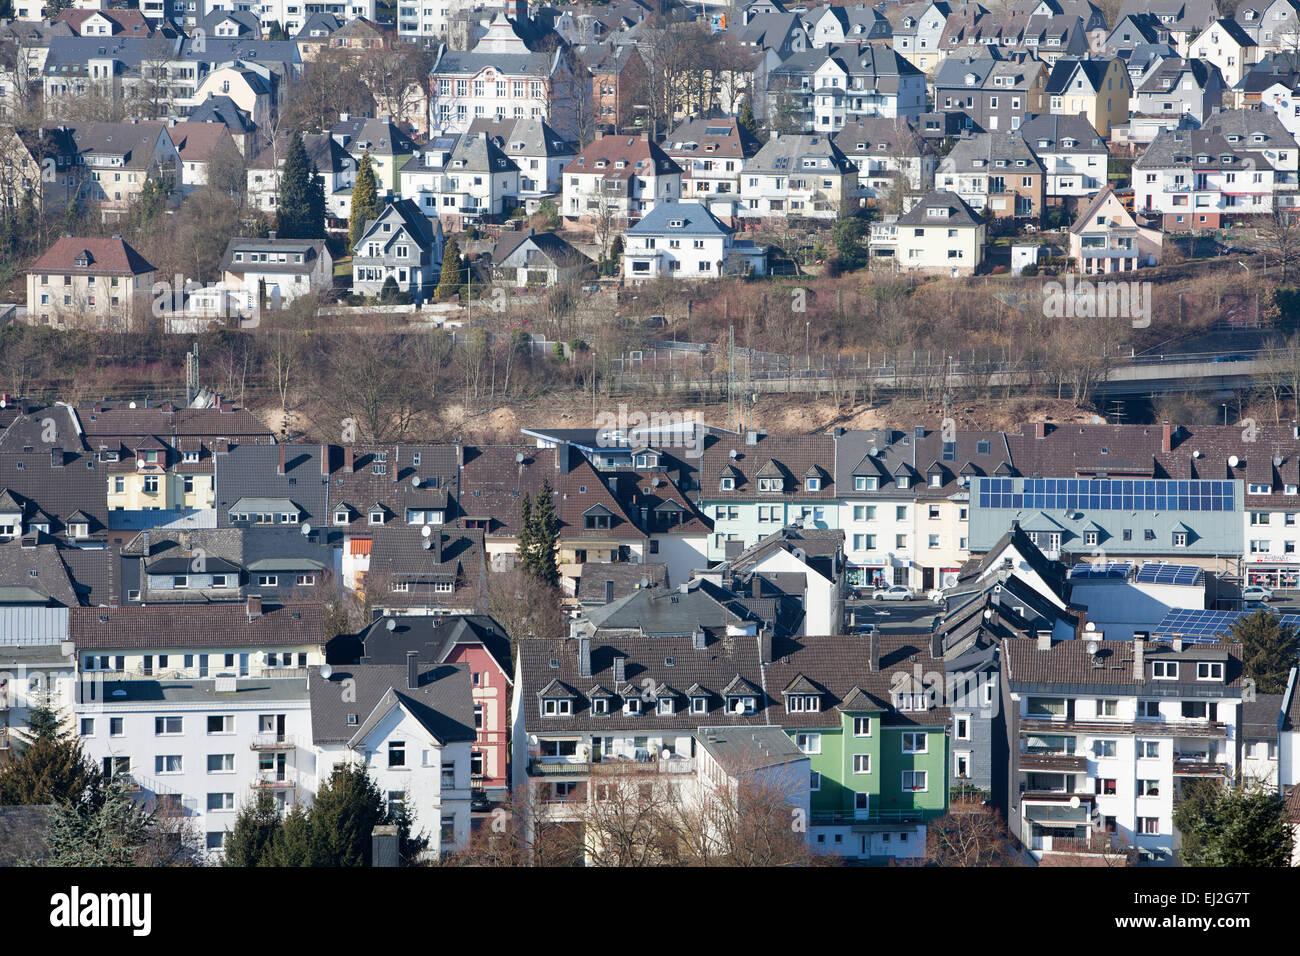 Panoramic view of Siegen, North Rhine-Westphalia, Germany, Europe, - Stock Image